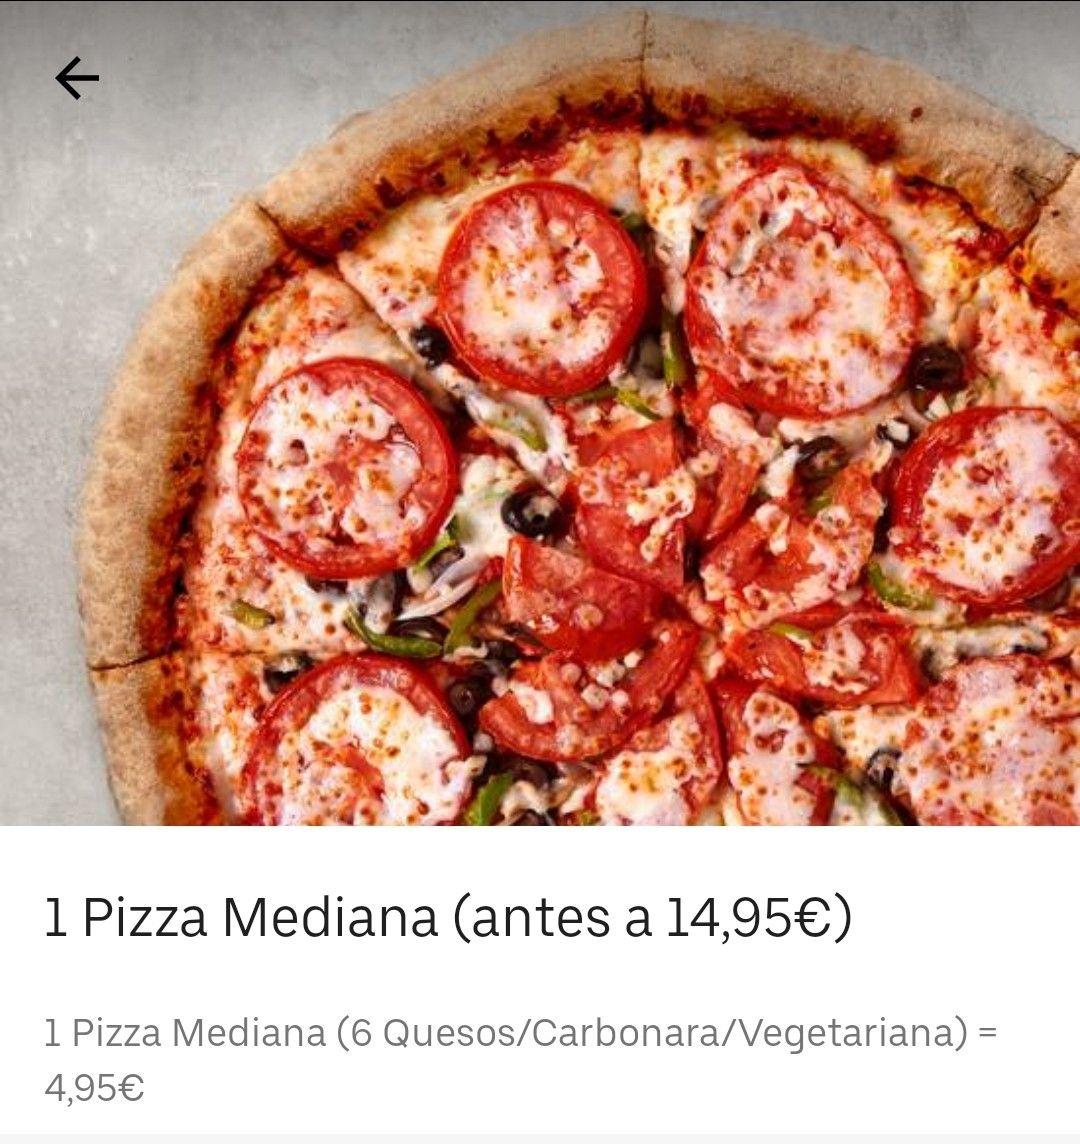 Pizza mediana 4.95 (Seis quesos, carbonara o vegetariana) - Papa Johns Uber Eats